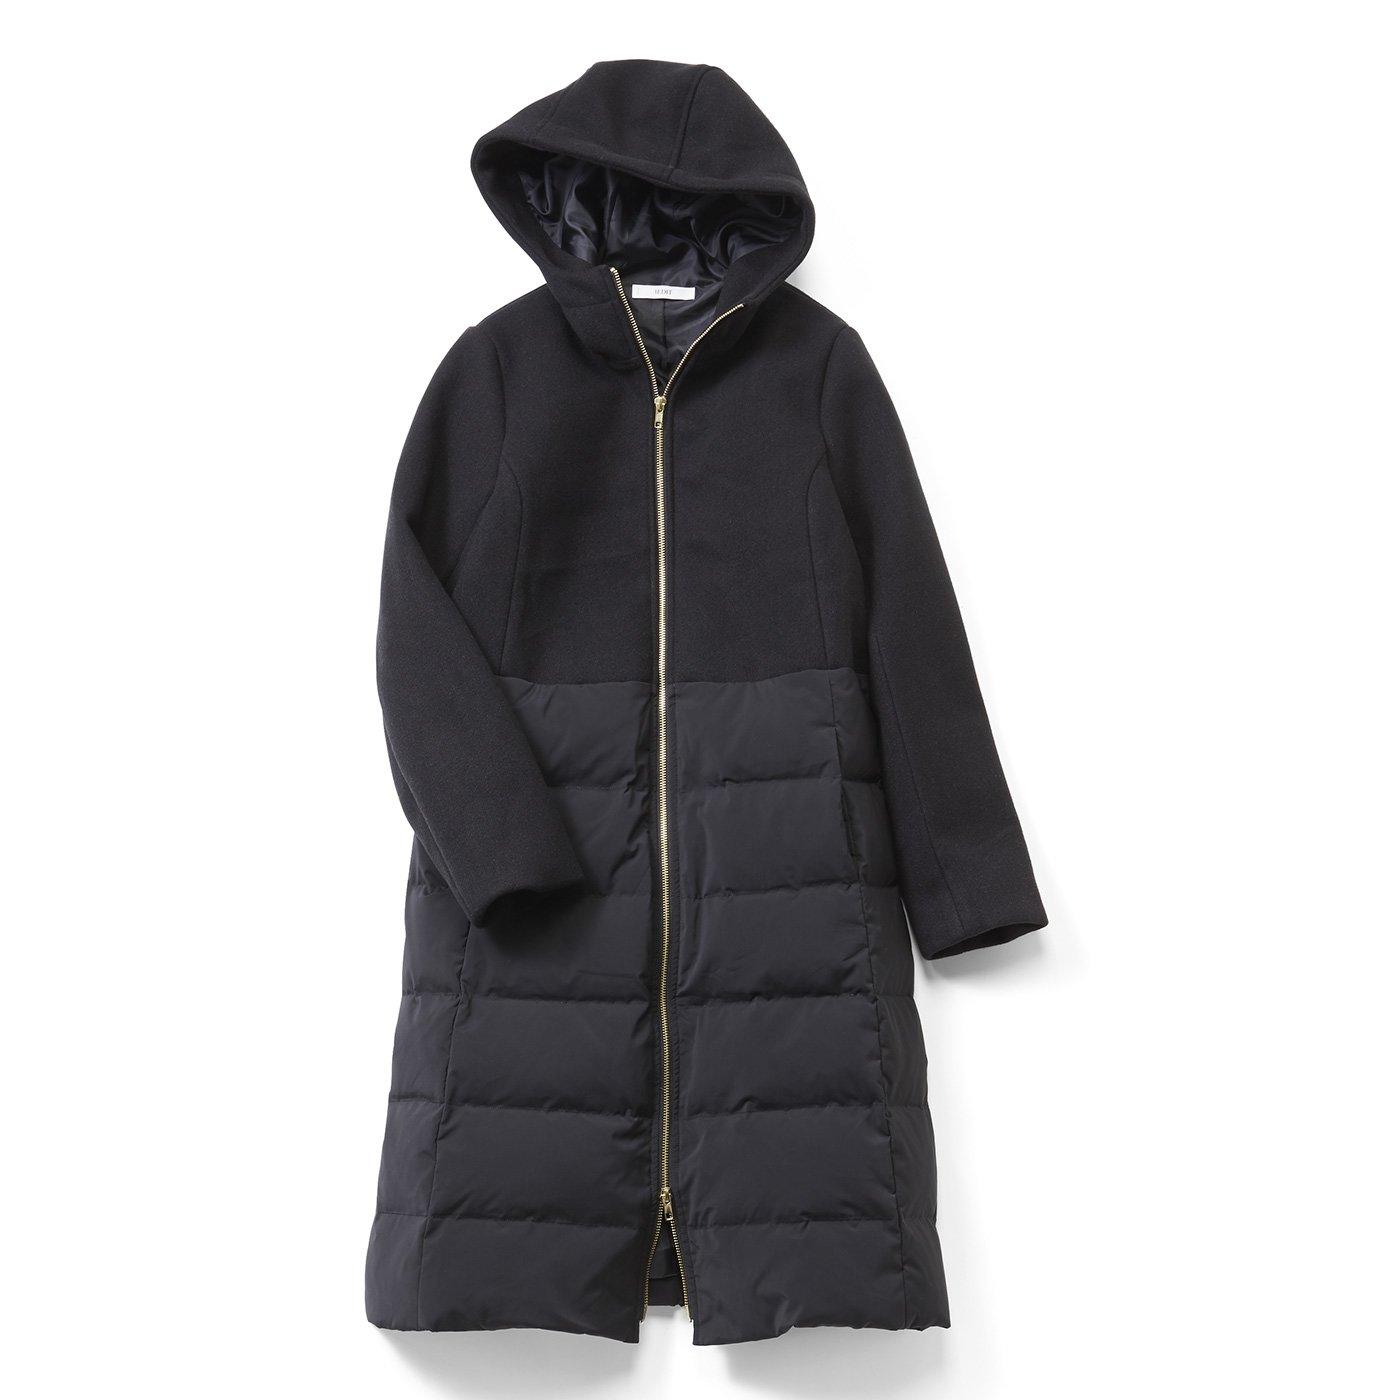 IEDIT[イディット] メルトン風切り替えの きれいめダウン遣いコート〈ブラック〉